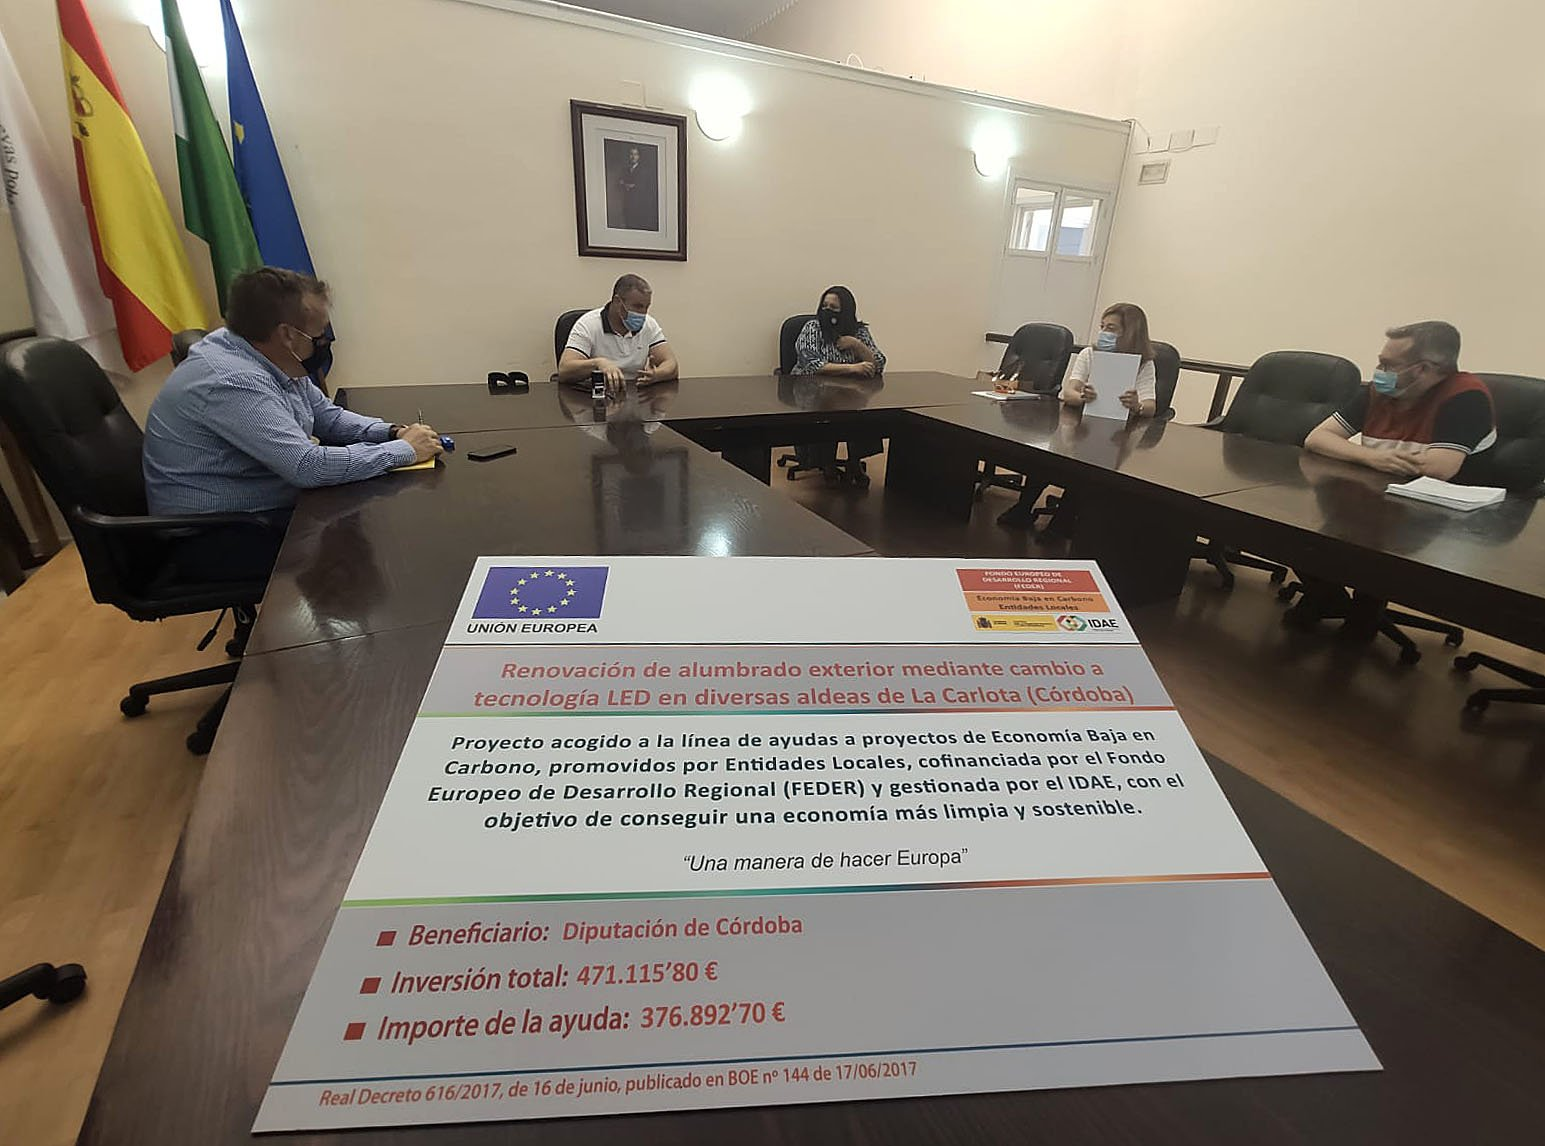 El municipio cordobés de La Carlota apuesta por el alumbrado LED